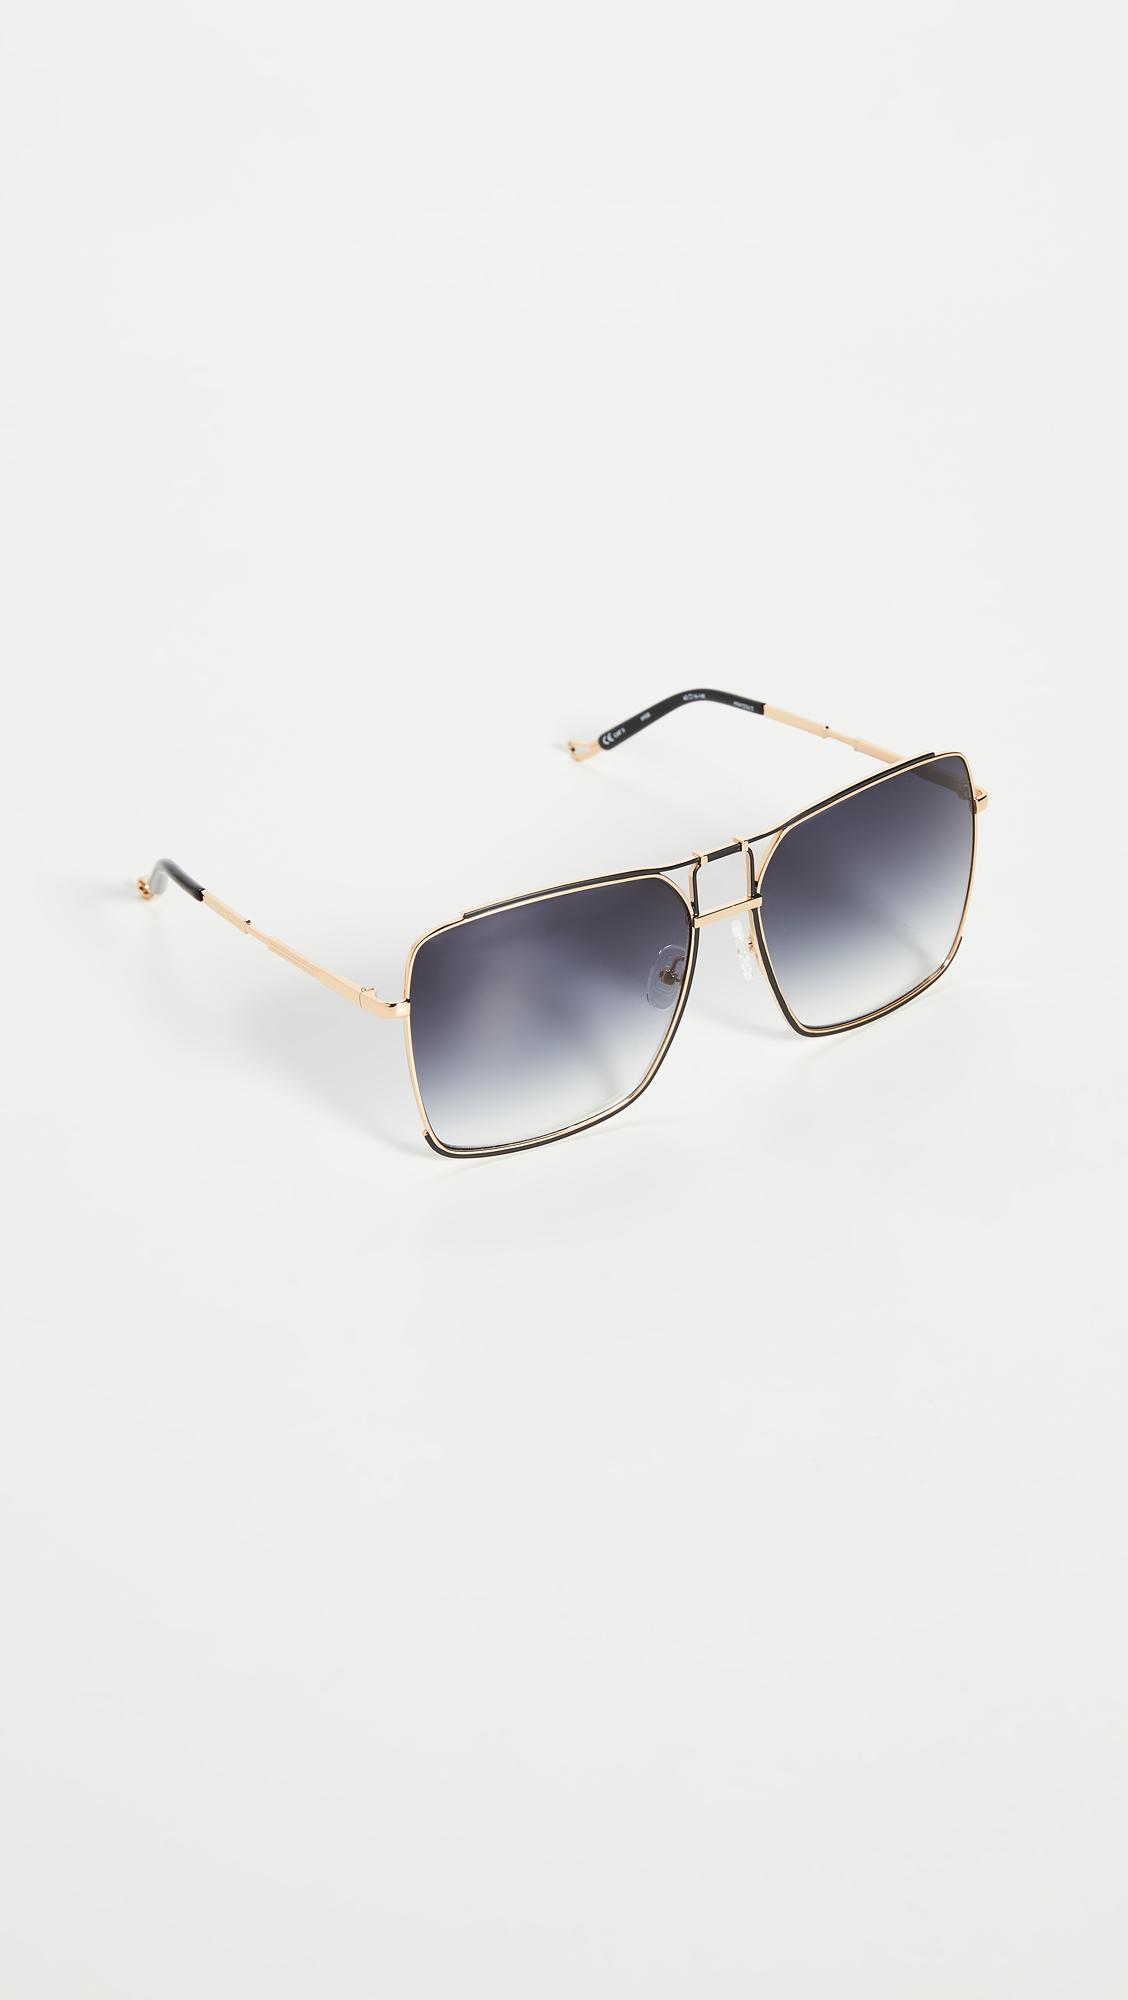 Linda Farrow Luxe Mathew Williamson x Linda Farrow Square Sunglasses